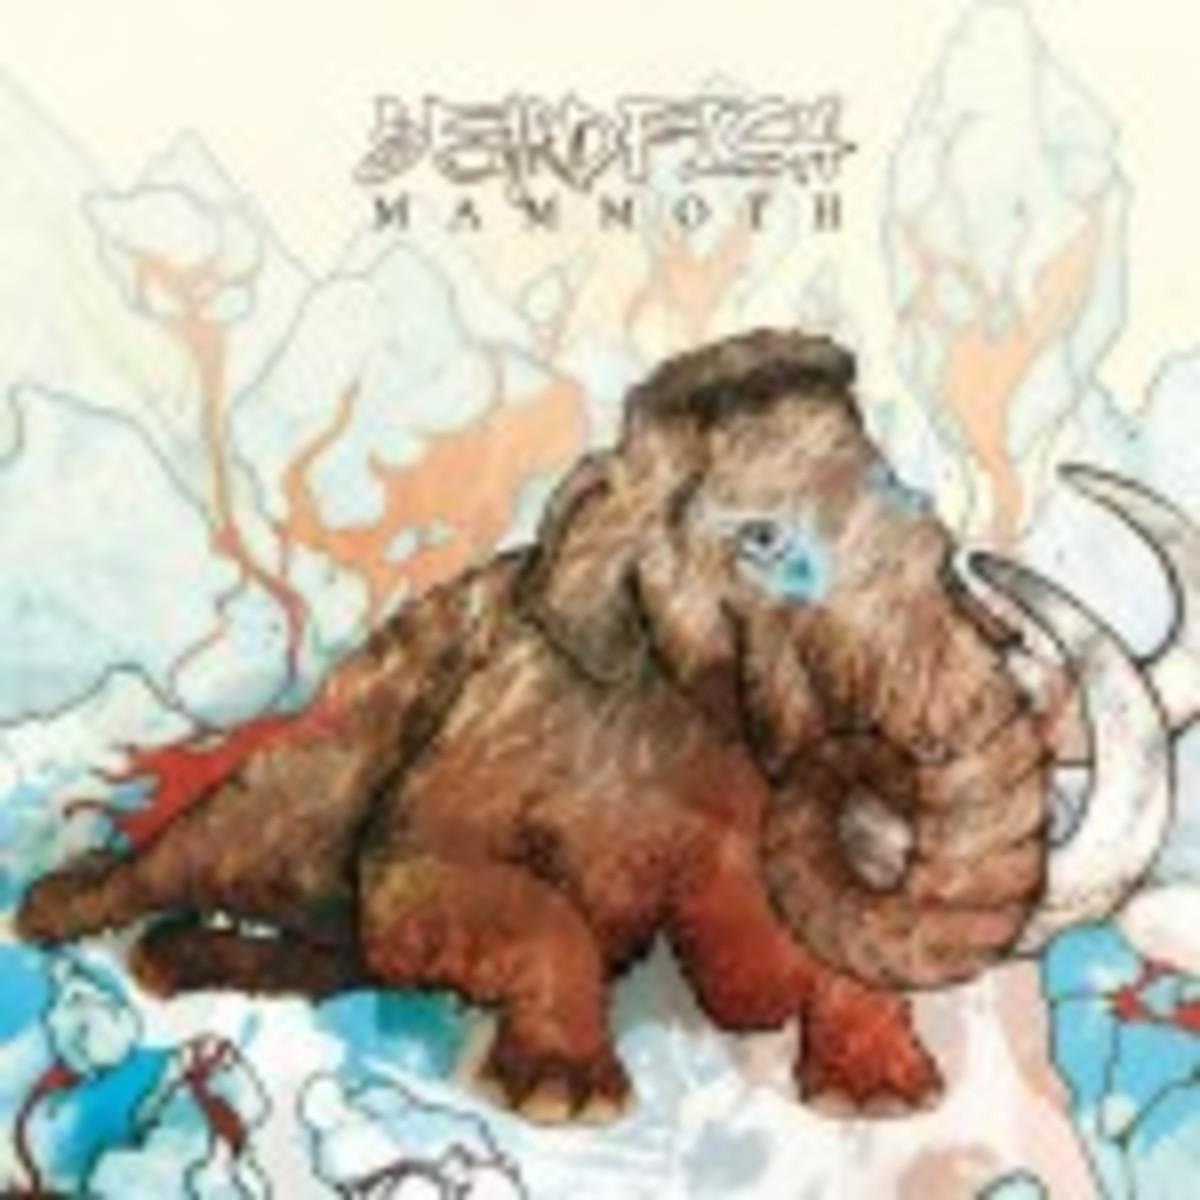 Mammoth by Beardfish